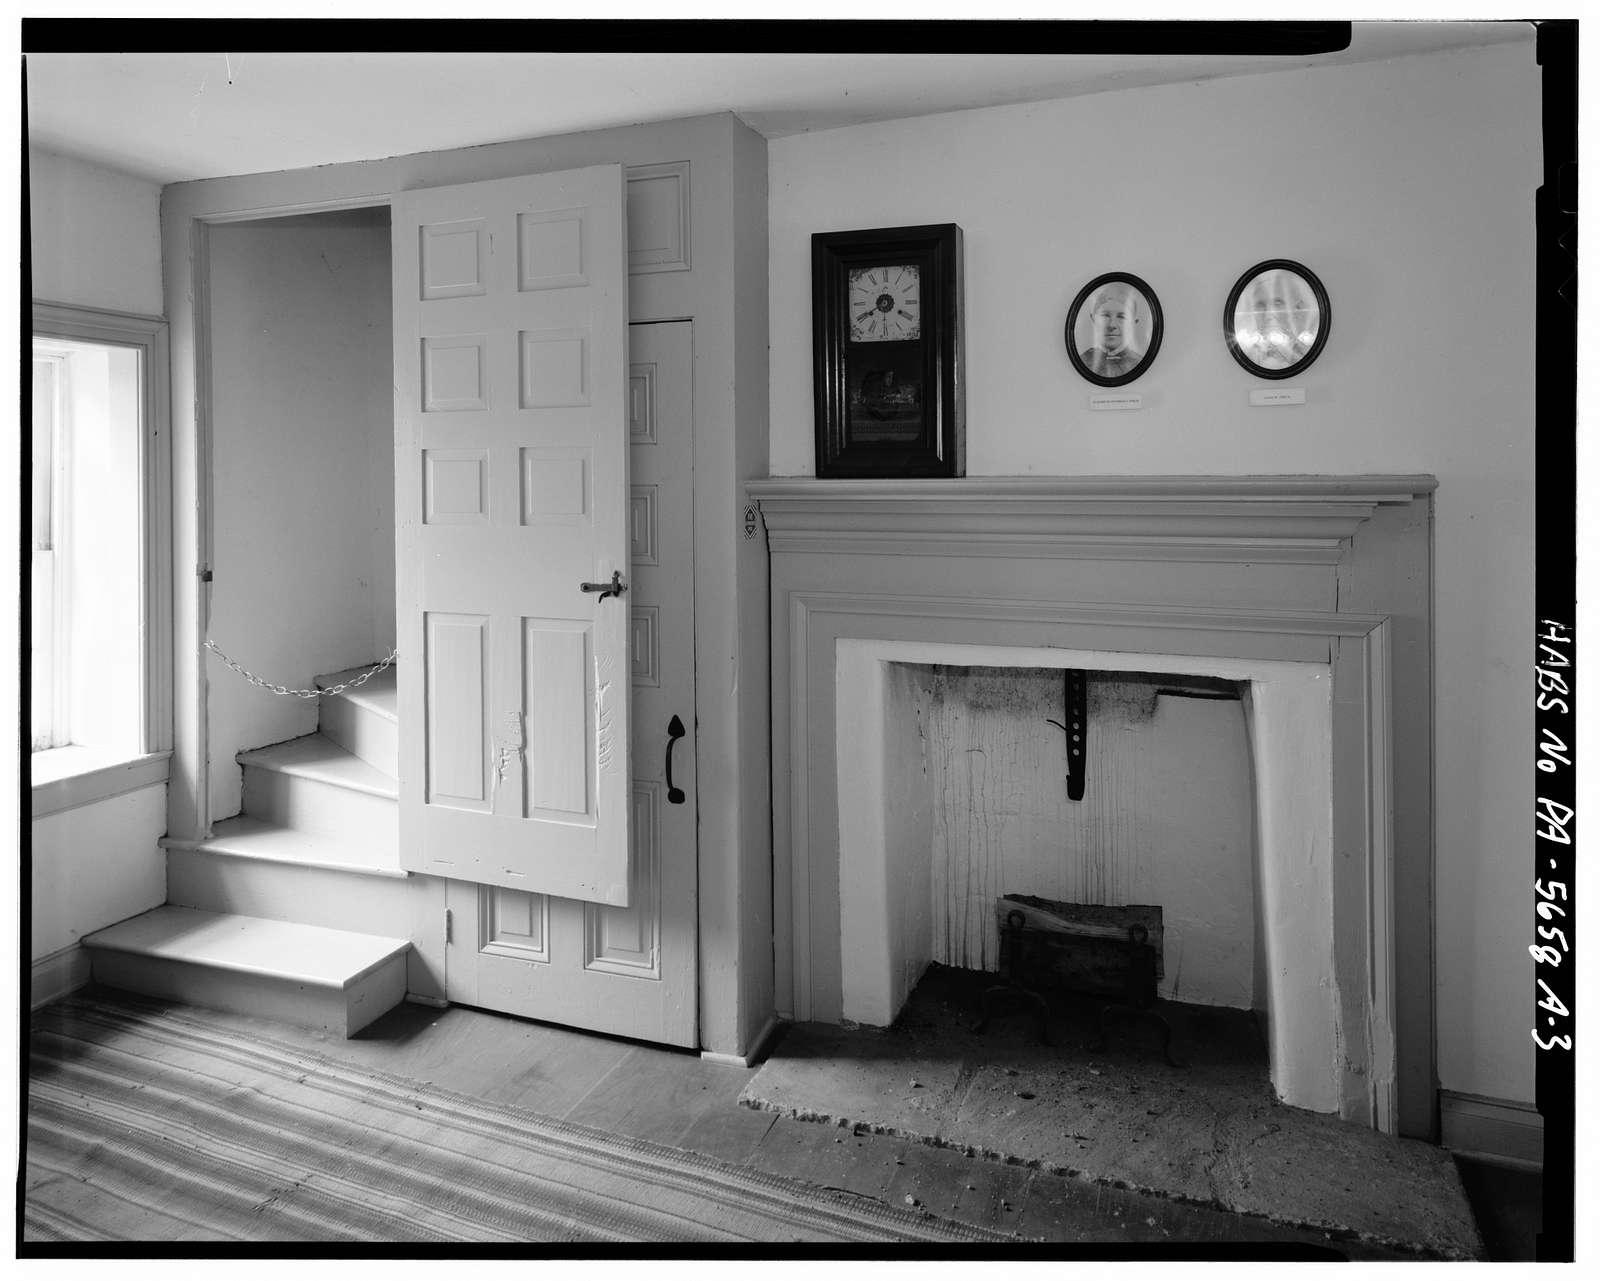 Abraham Overholt House, Springhouse, Frick Avenue, West Overton, Westmoreland County, PA